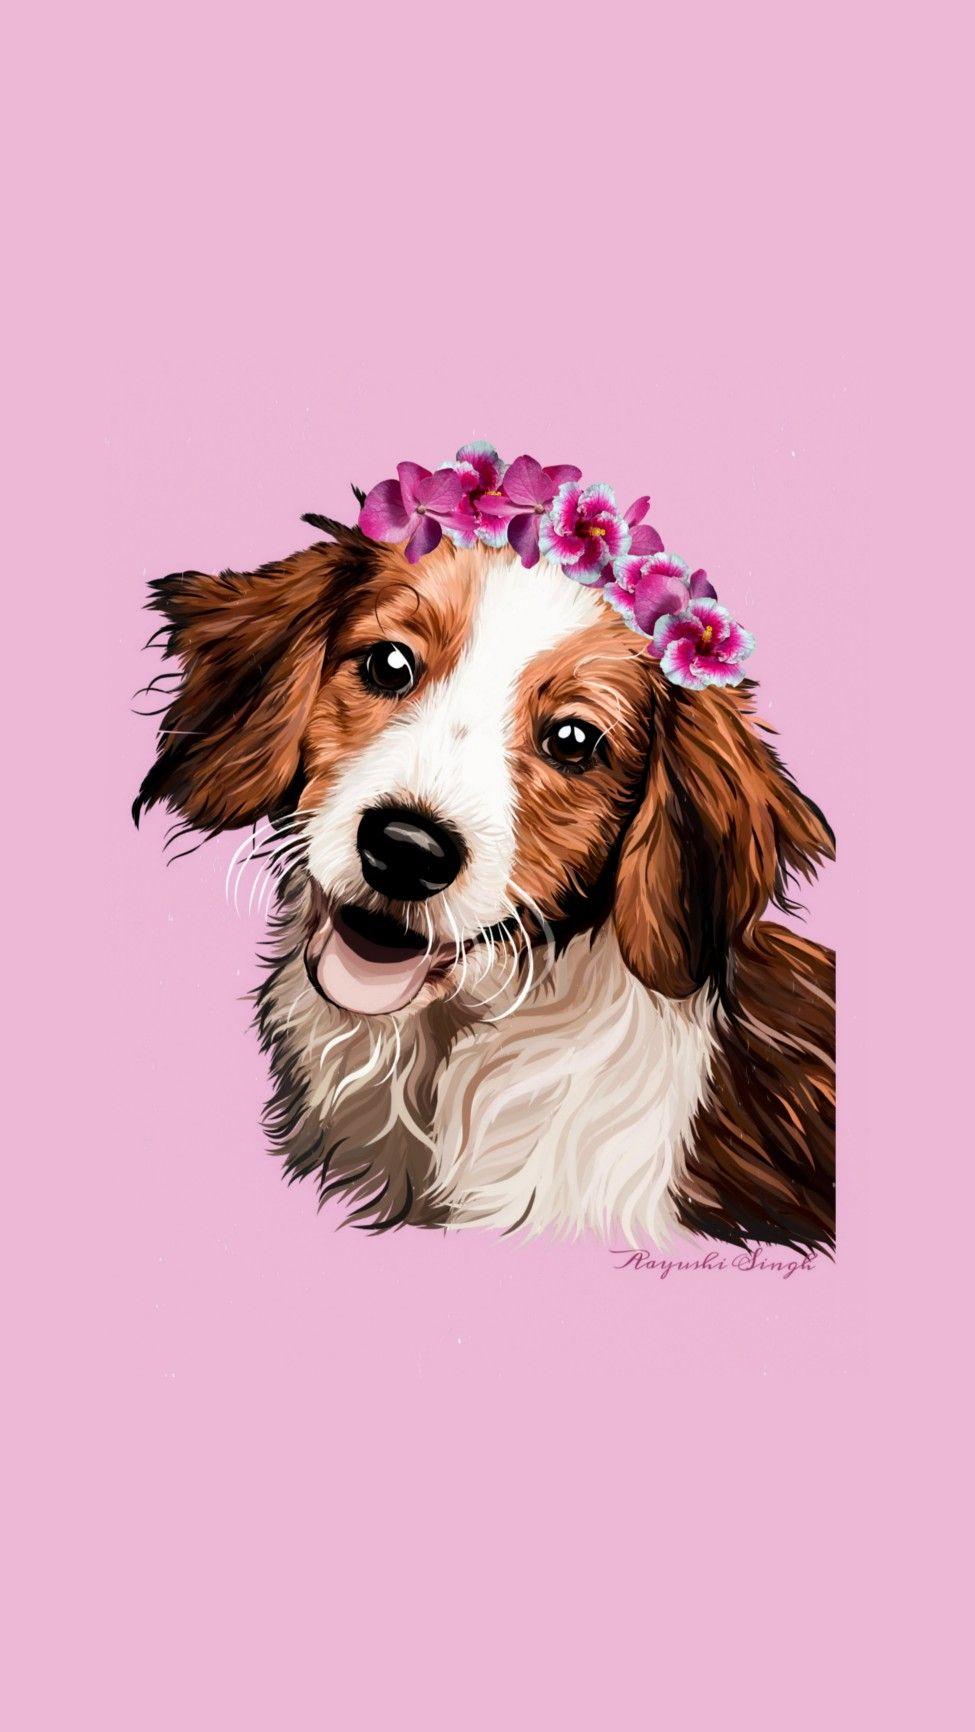 Doggo amazing wallpaper designed 🤩 #dogillustration #dogwallpaper #illustration #wallpaper